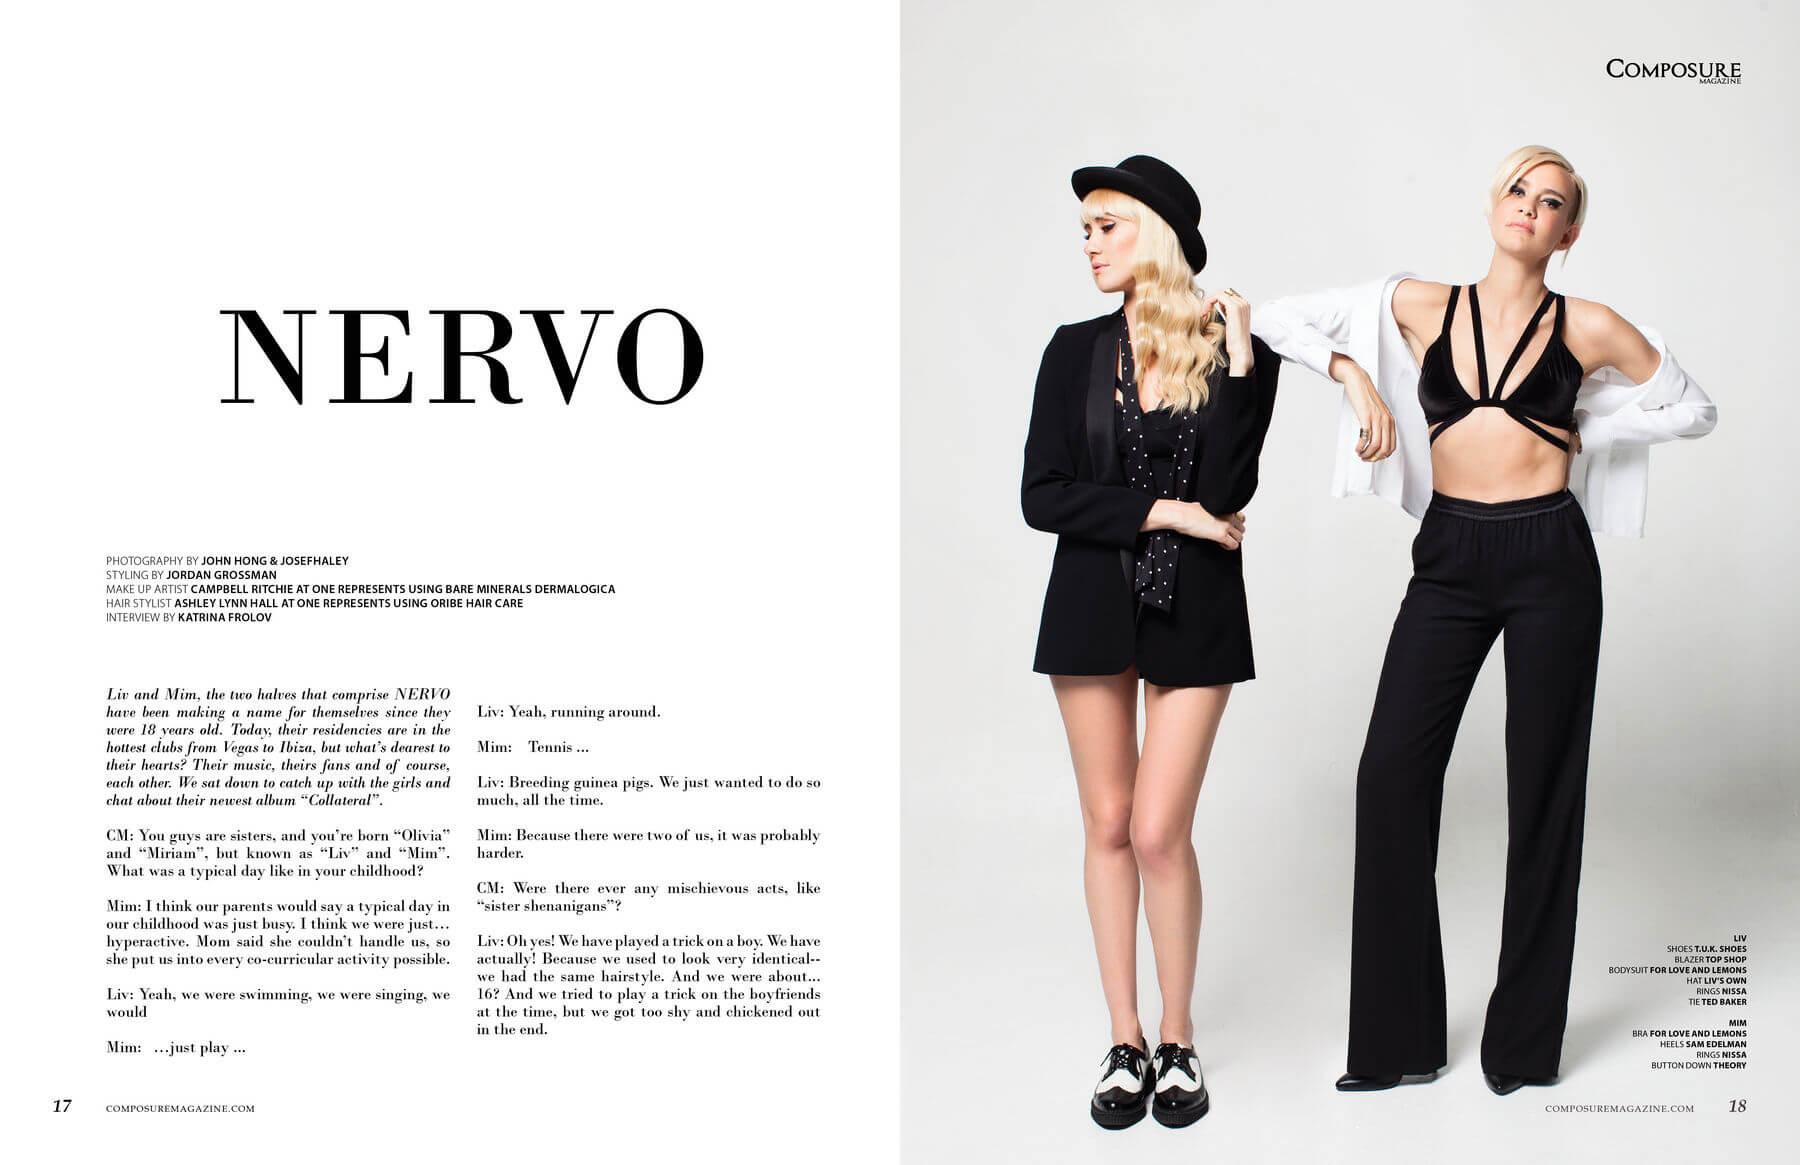 nervos teen models